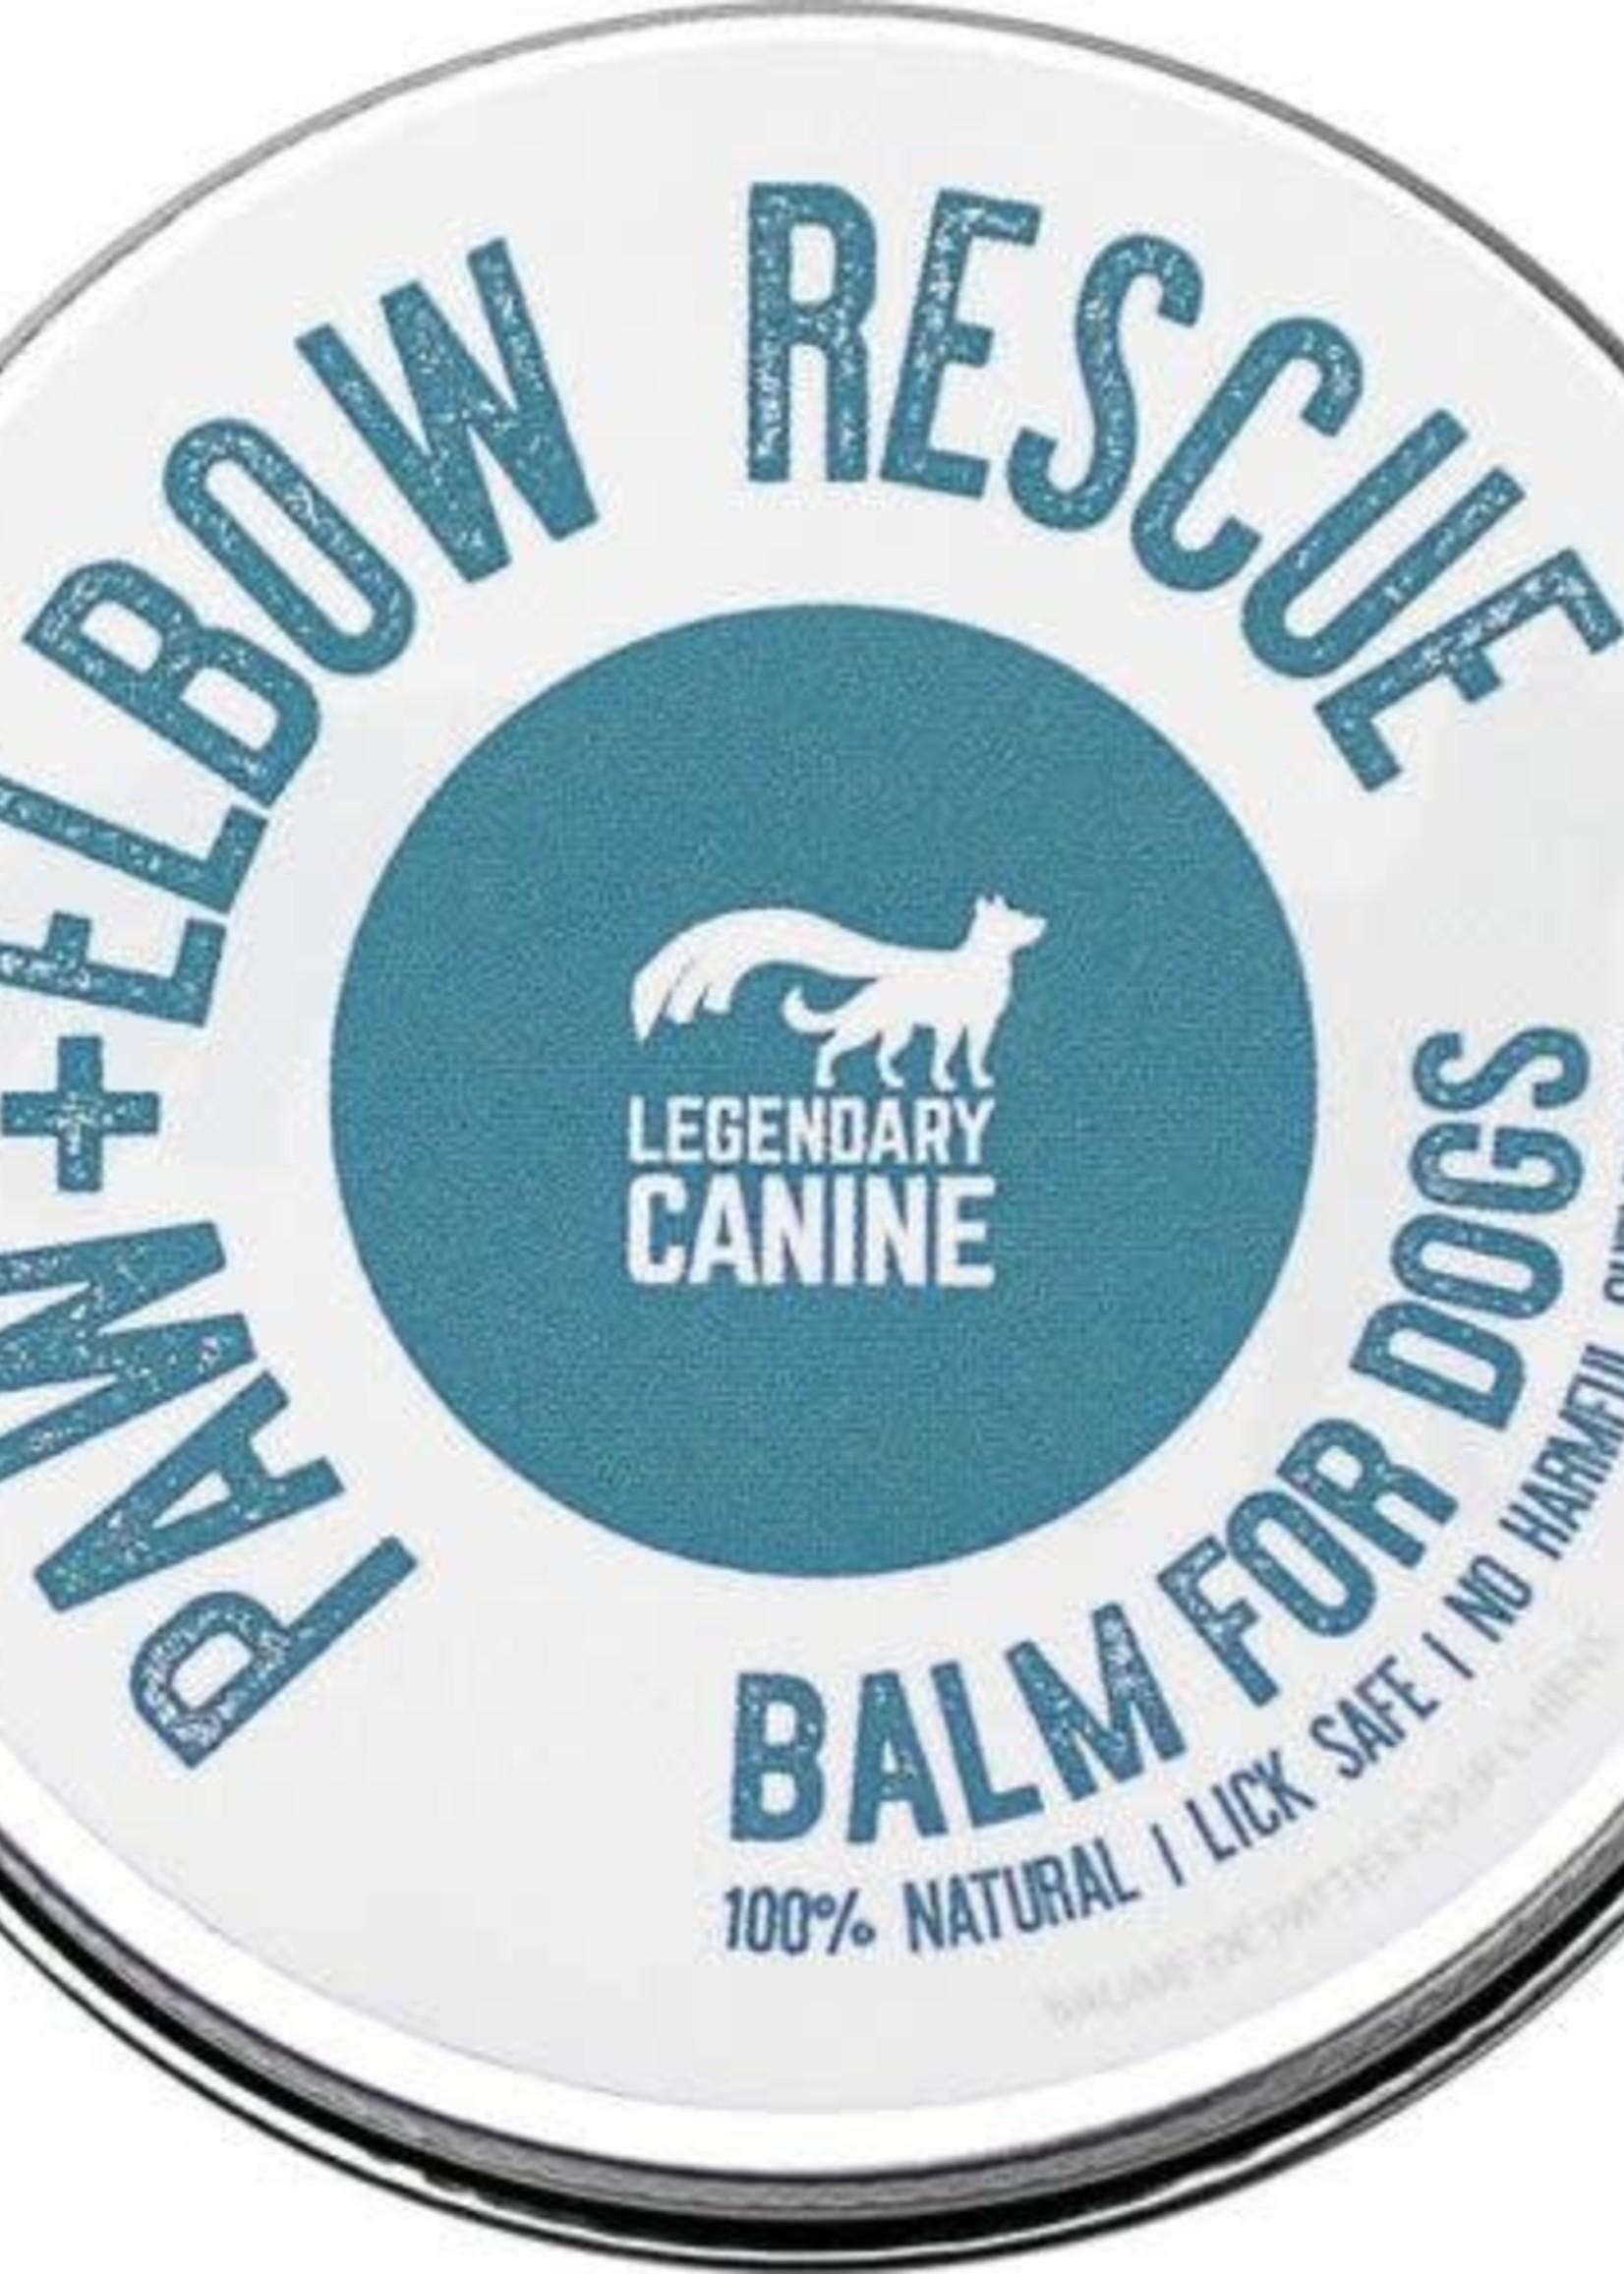 Legendary Canine Legendary Canine Paw & Elbow Rescue 60mL